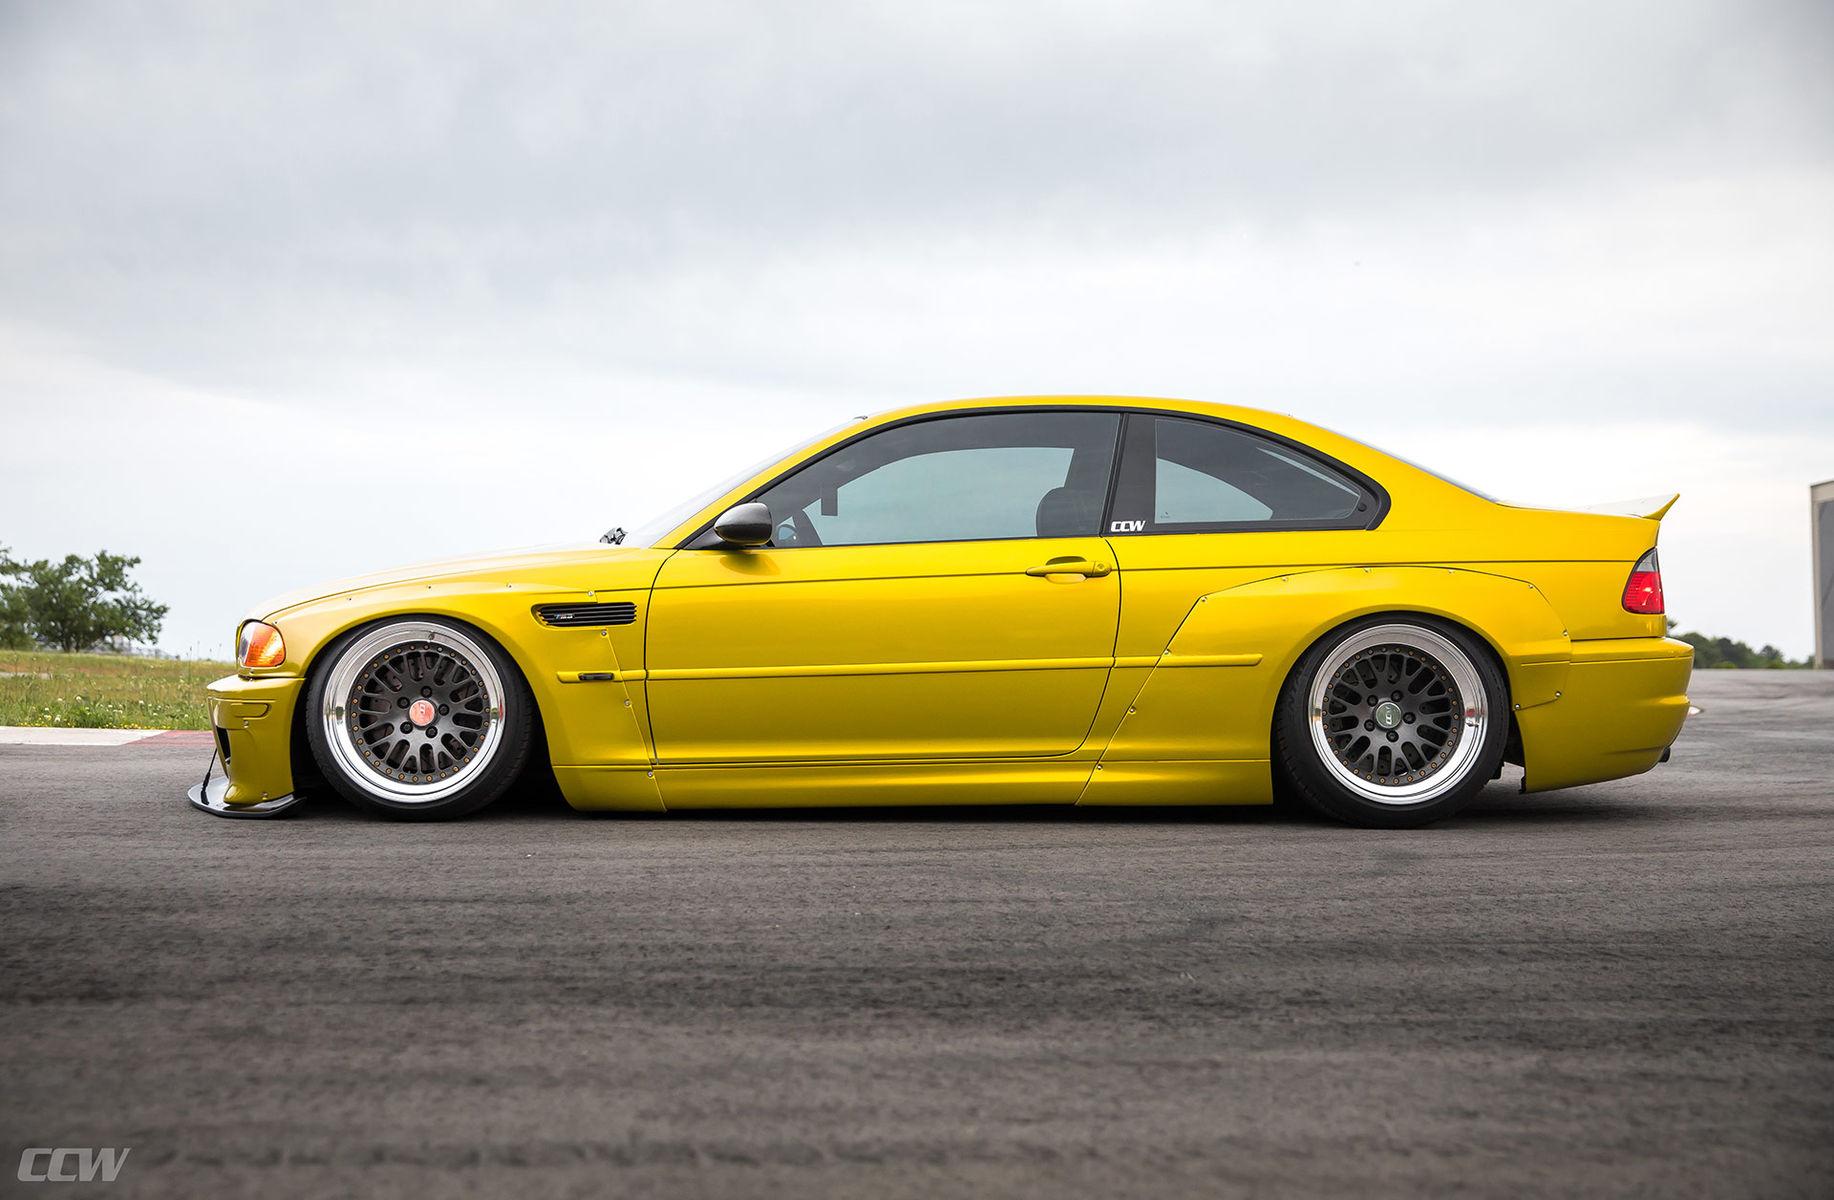 BMW M3 | Phoenix Yellow Pandem Widebody E46 M3 - CCW Classic 3 Piece Wheels